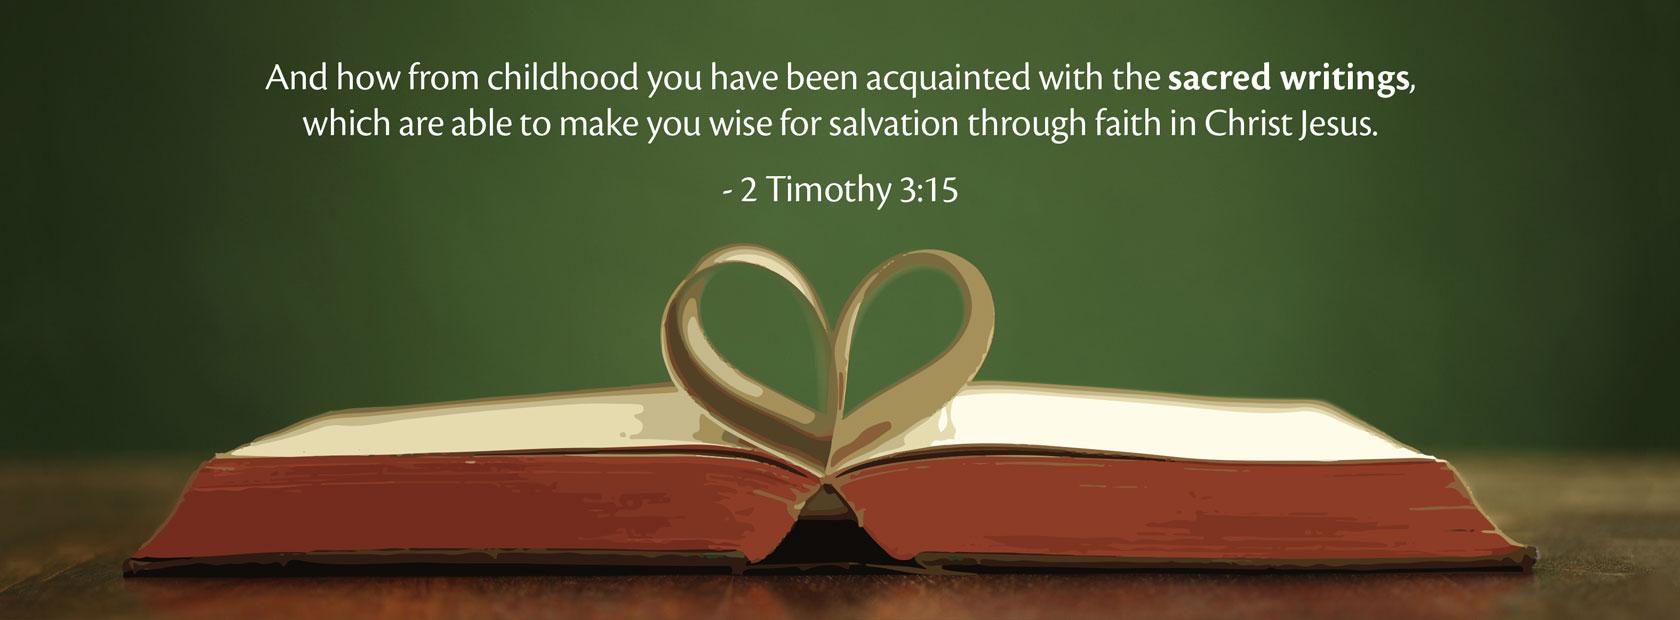 2 Timothy 3:15